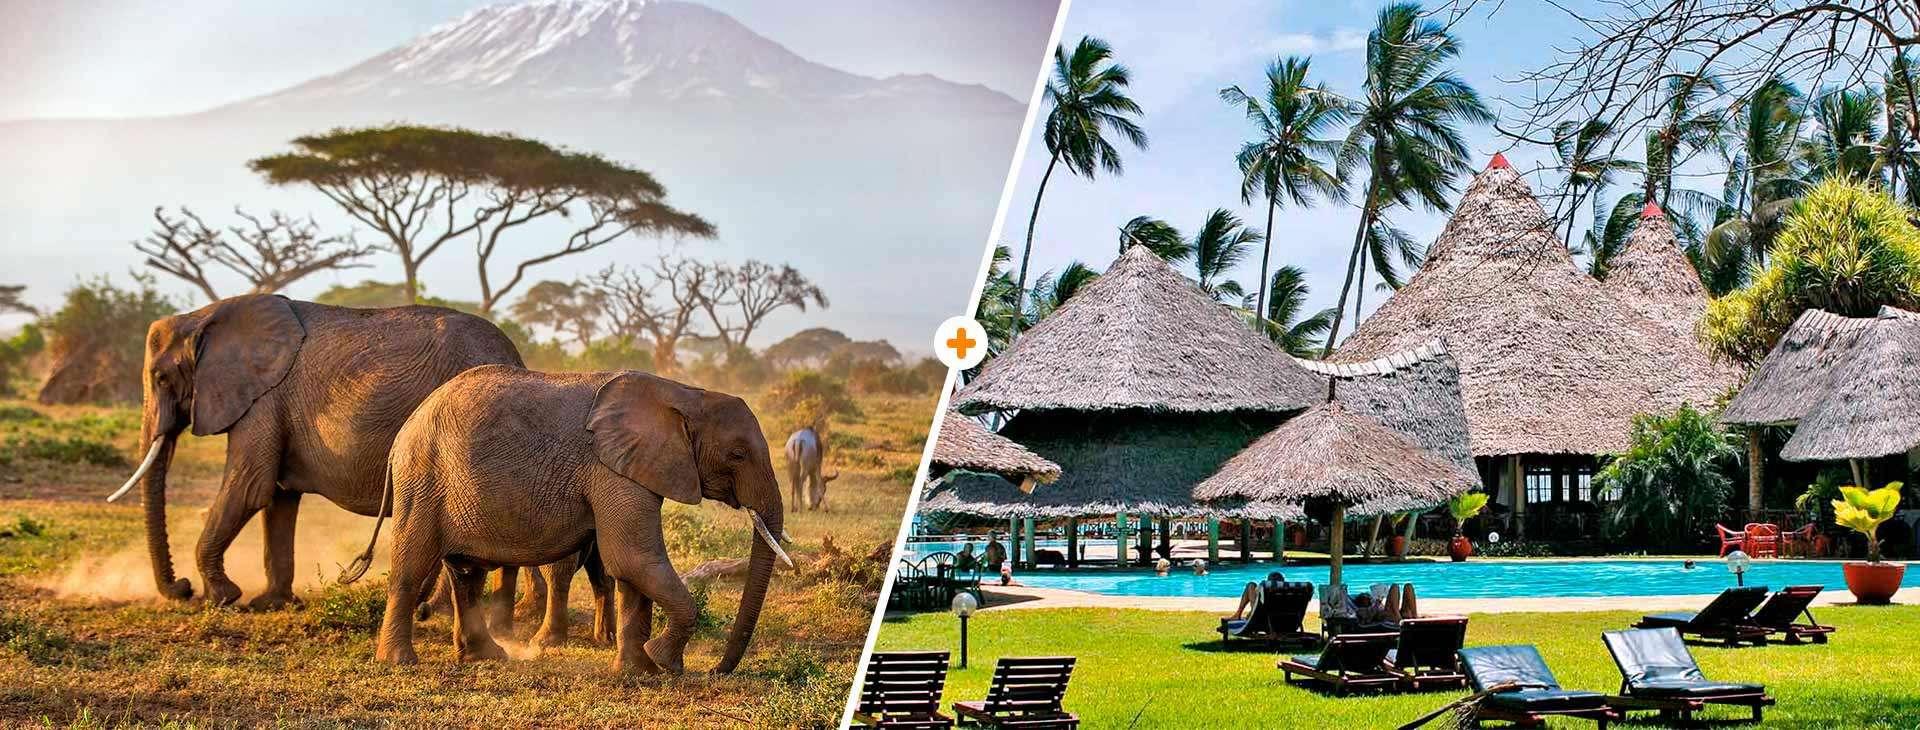 Powitanie z Afryką / Neptune Paradise Village